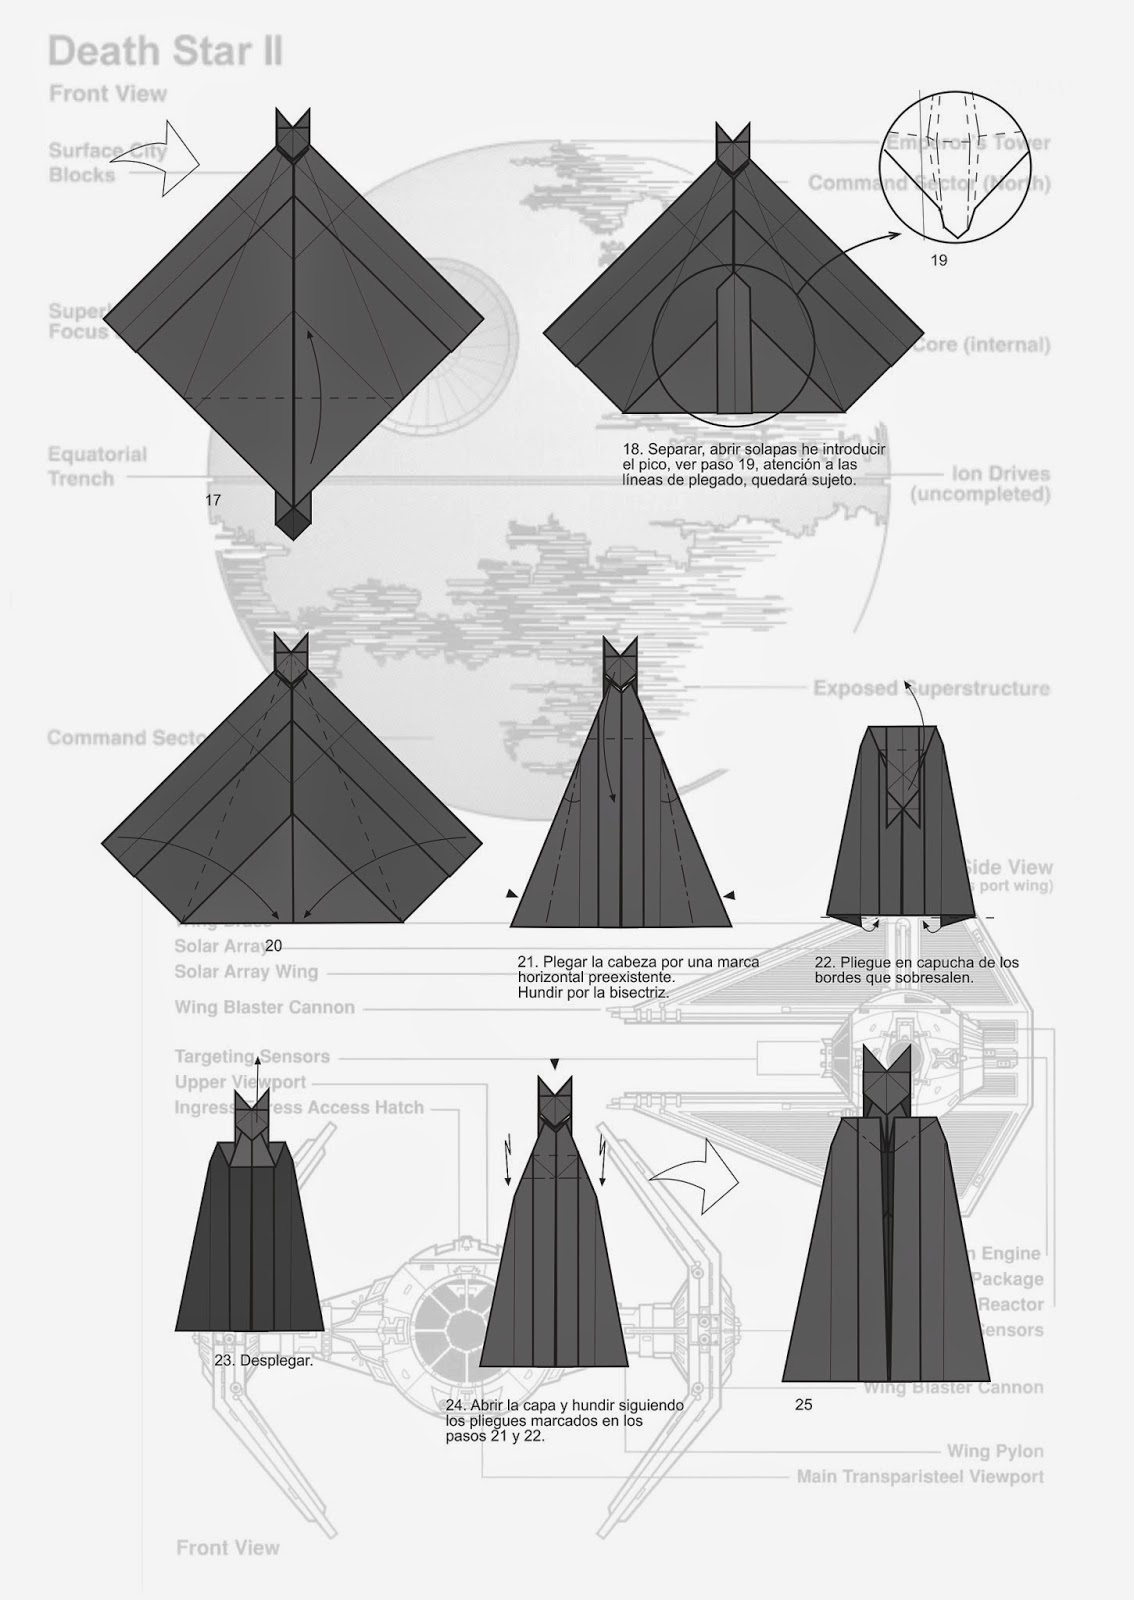 DIS.MITH: Darth Vader origami diagram - photo#5